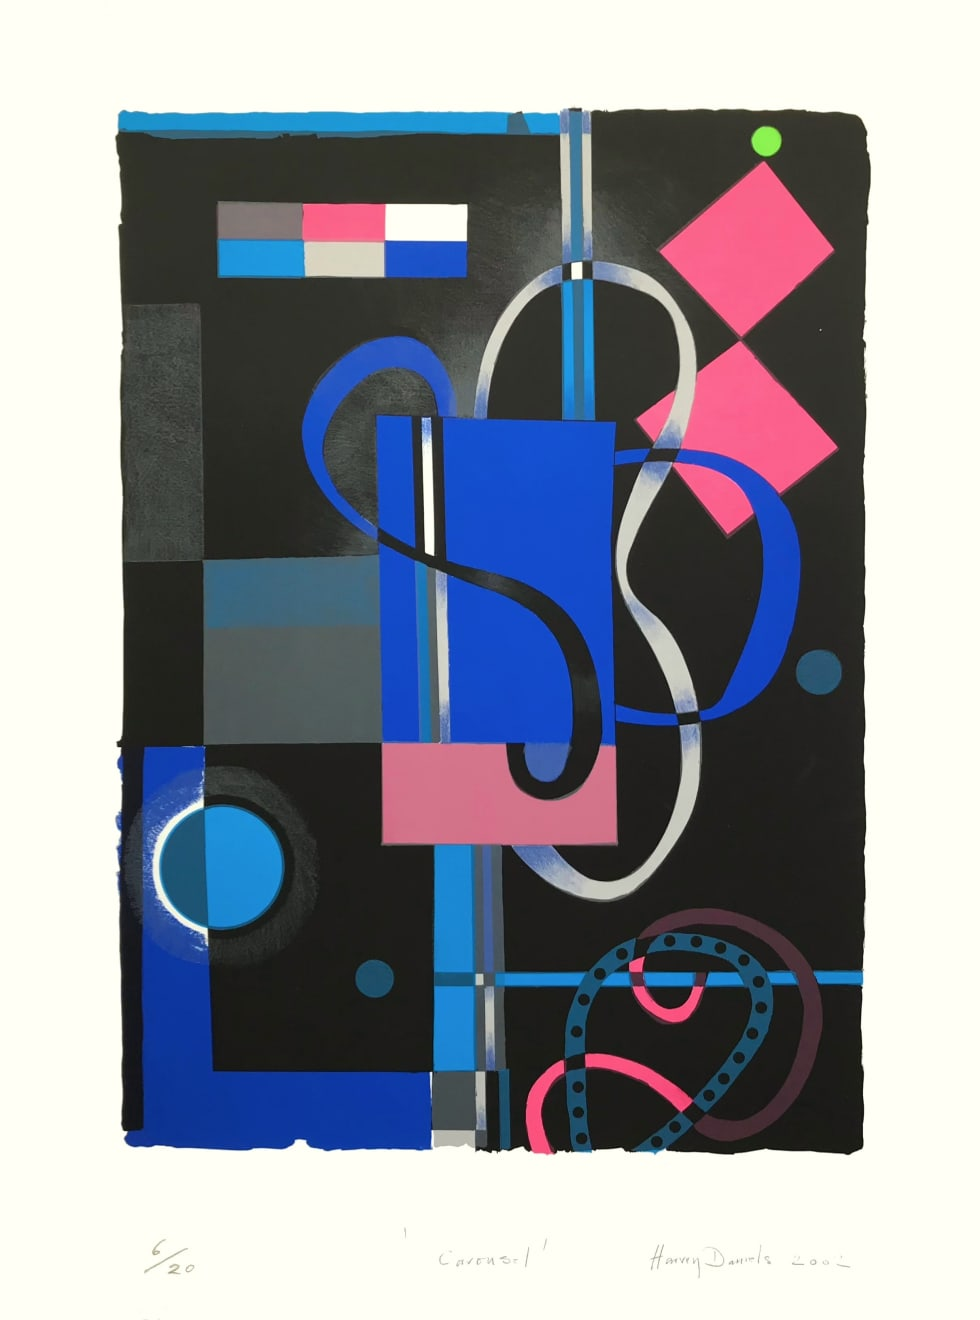 Harvey Daniels, Carousel, 2002